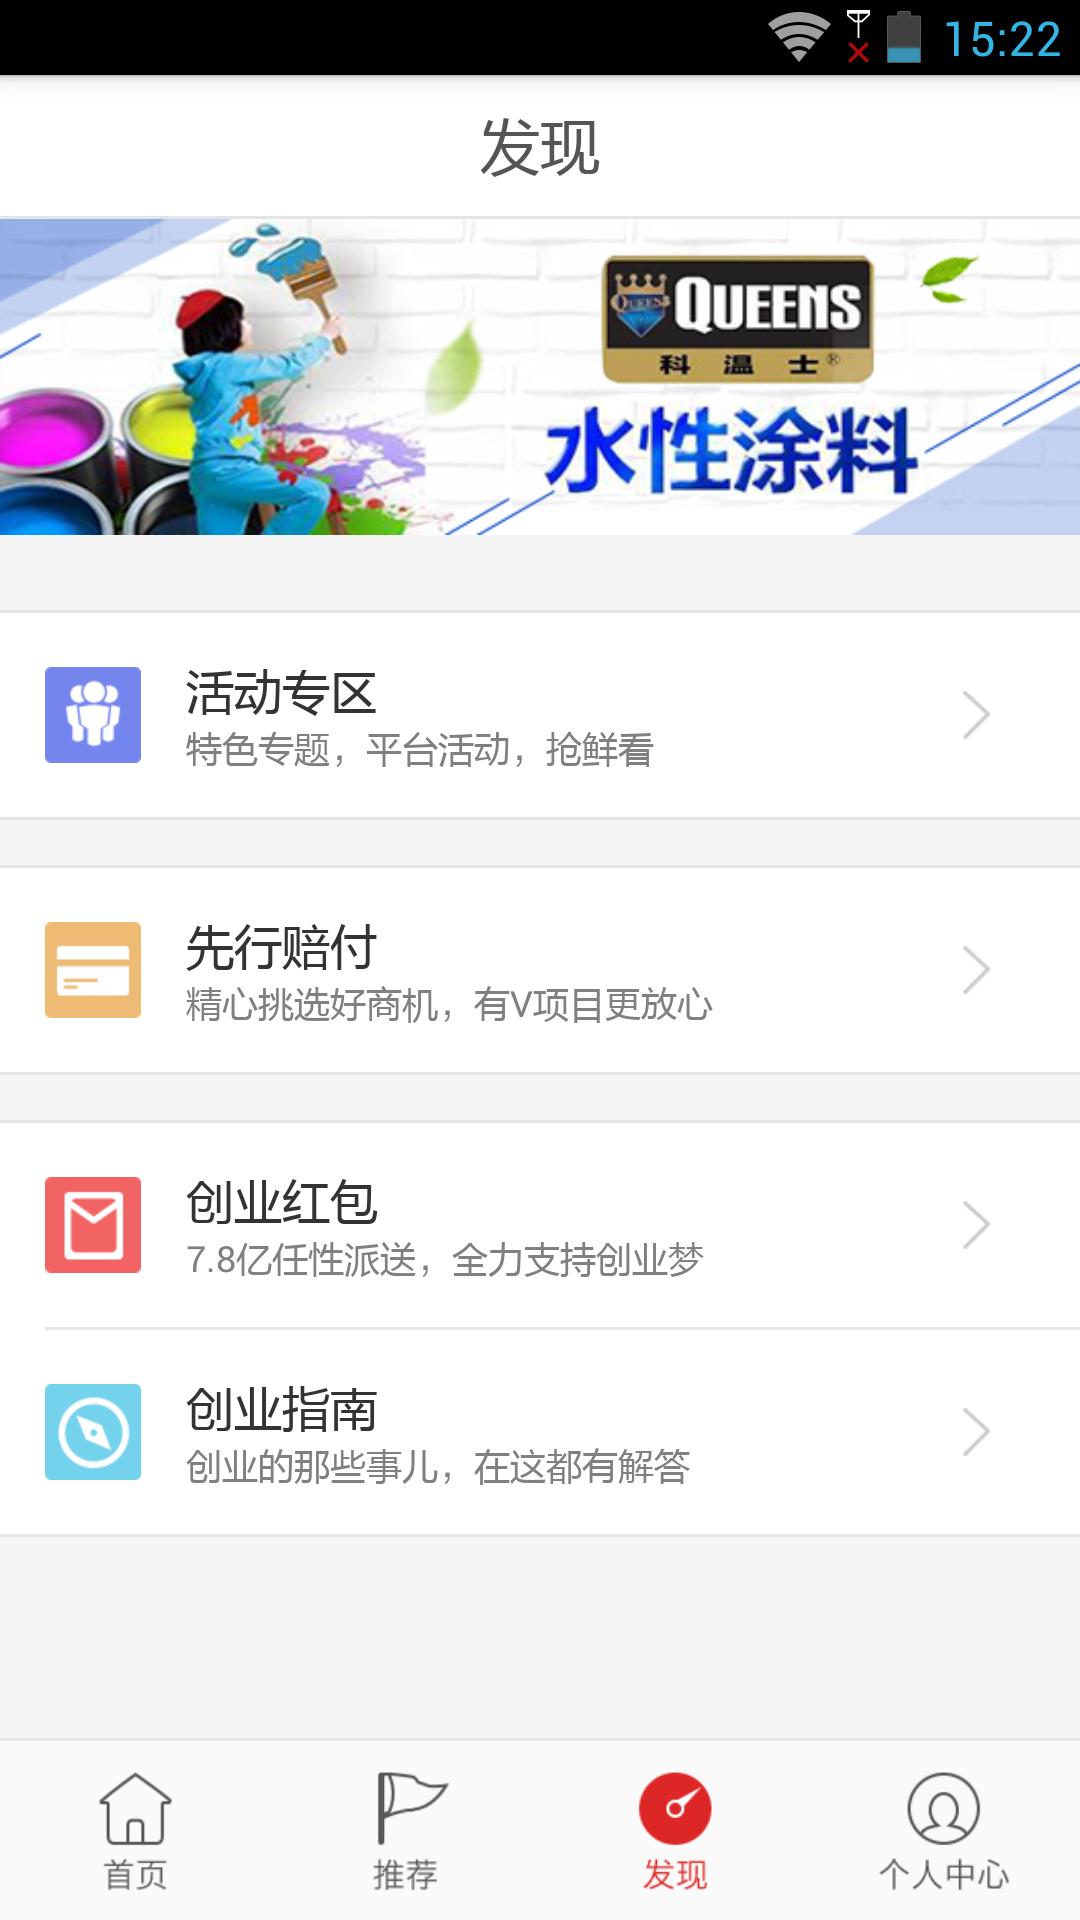 78.cn创业商机网截图4